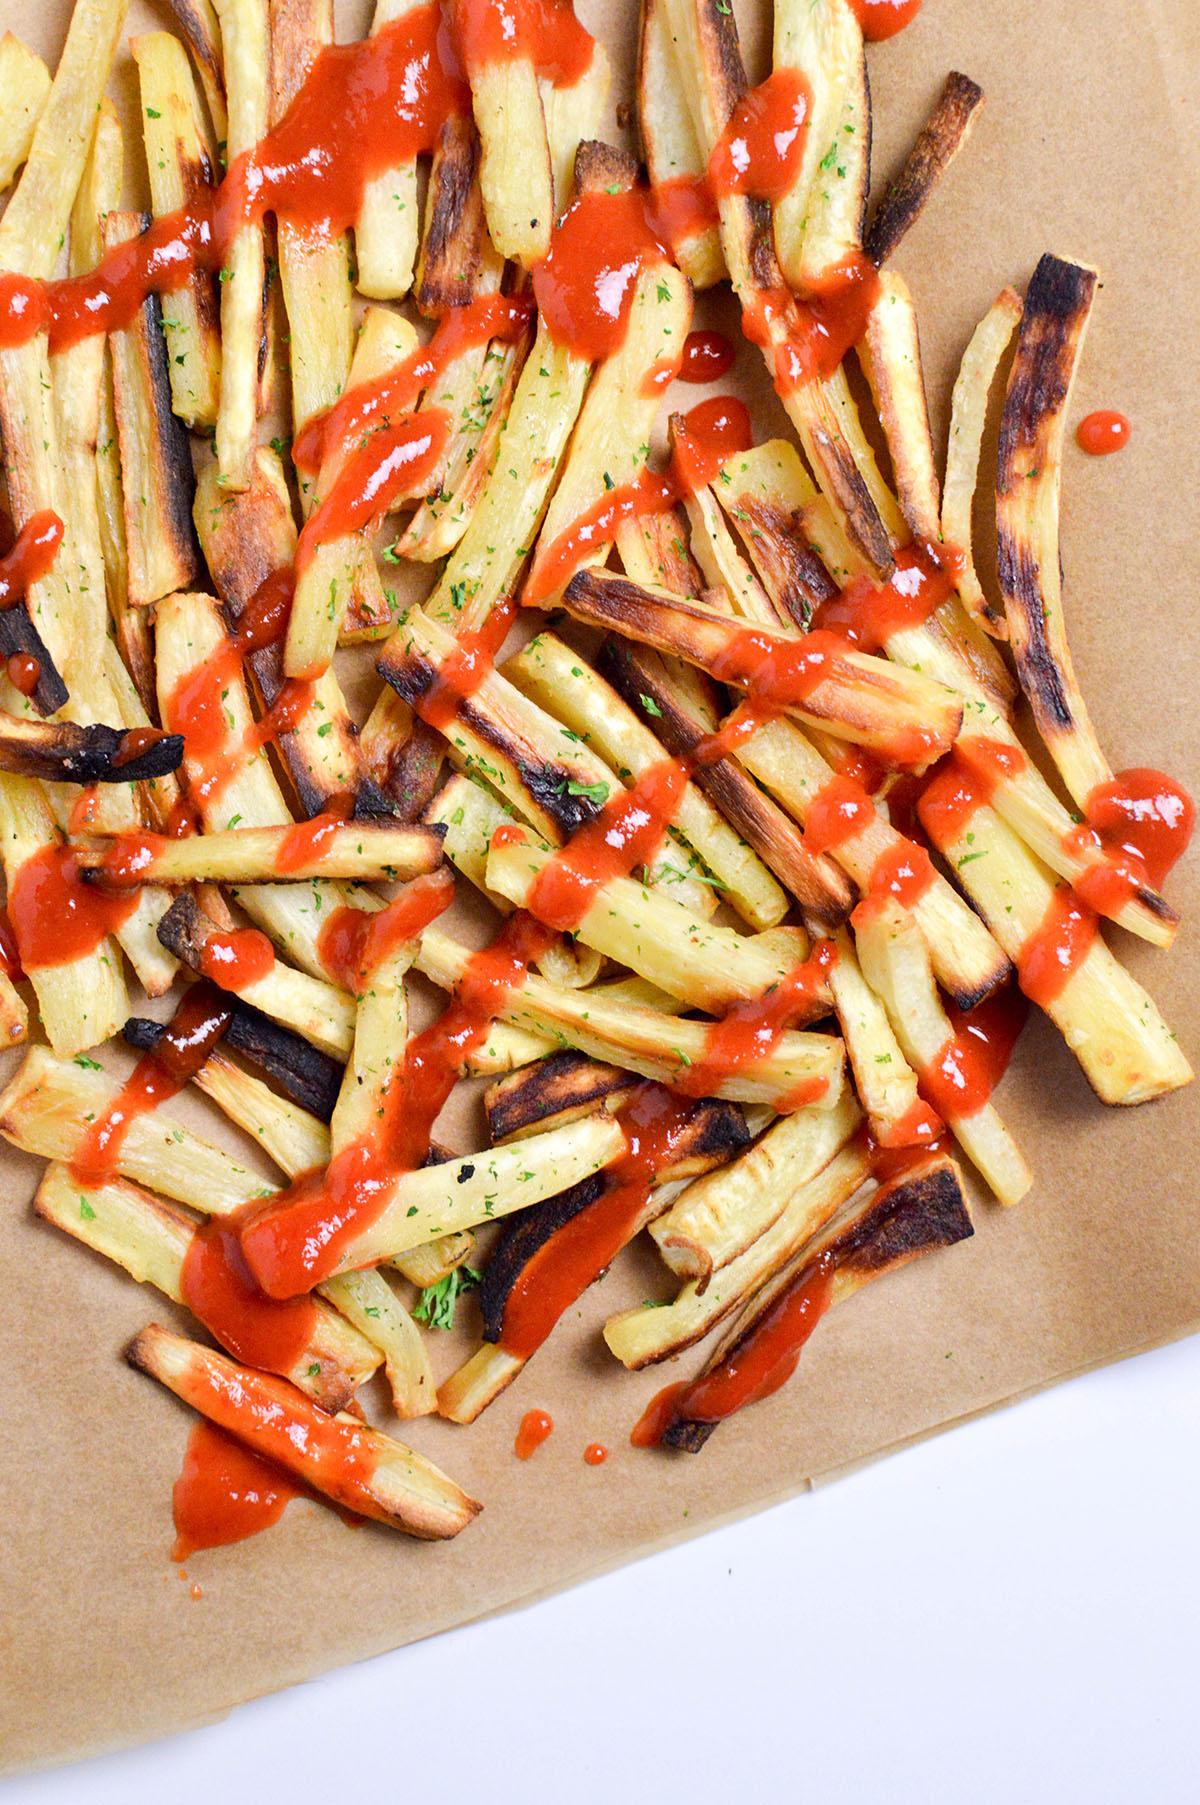 Baked Sriracha Parsnip Fries